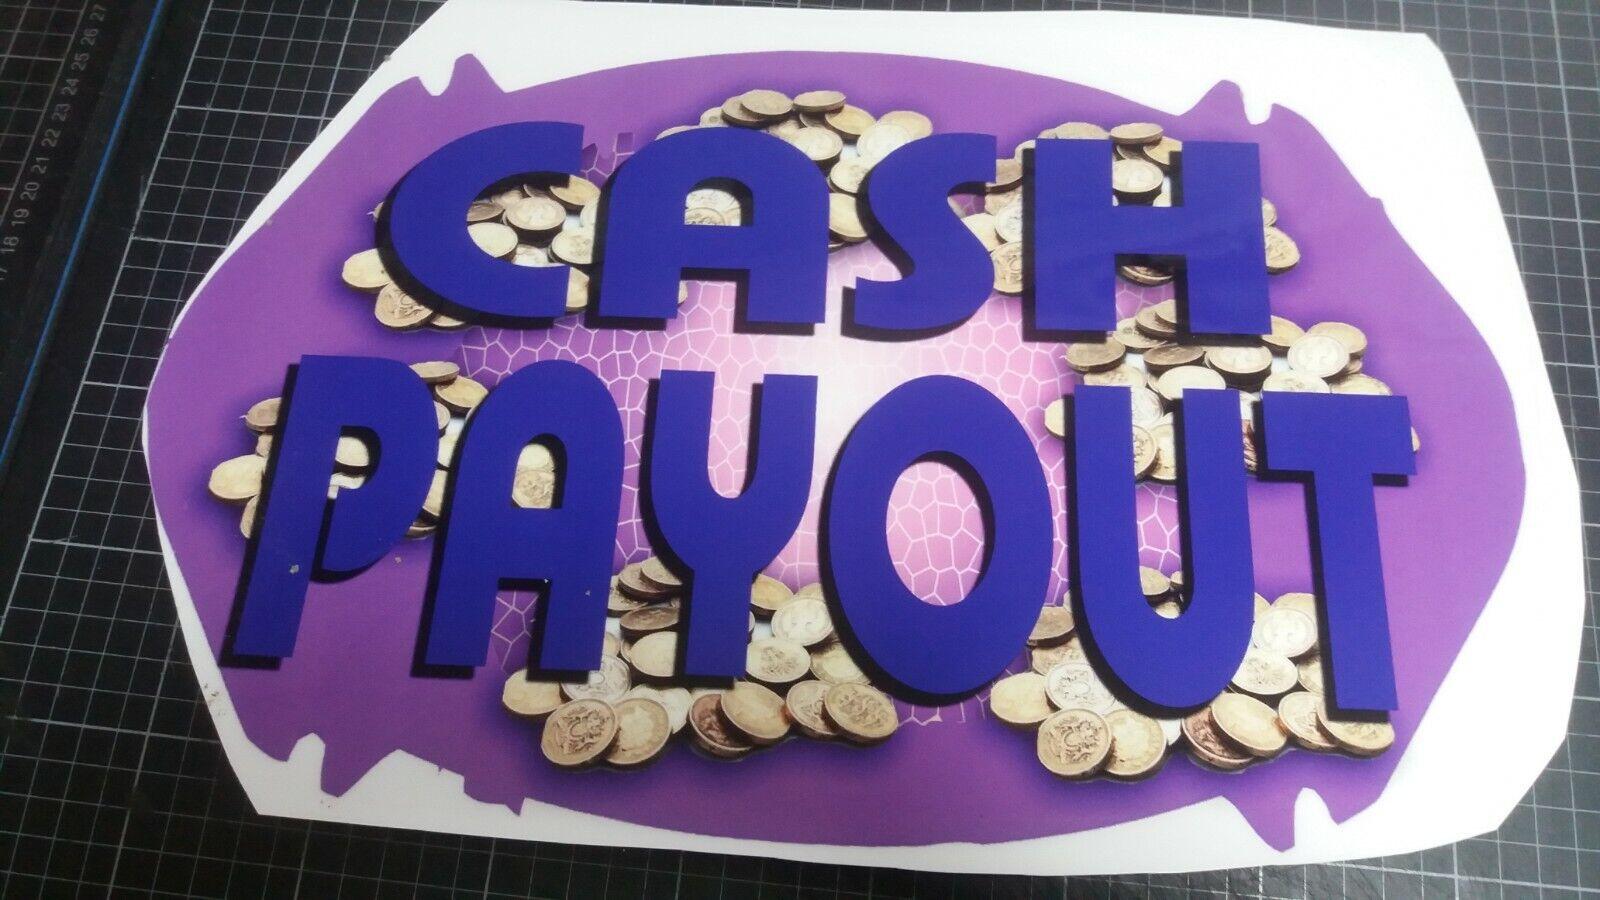 Obsolete Cash Payout Fruit Machine Decal 42cm x 27cm,Wall Art.